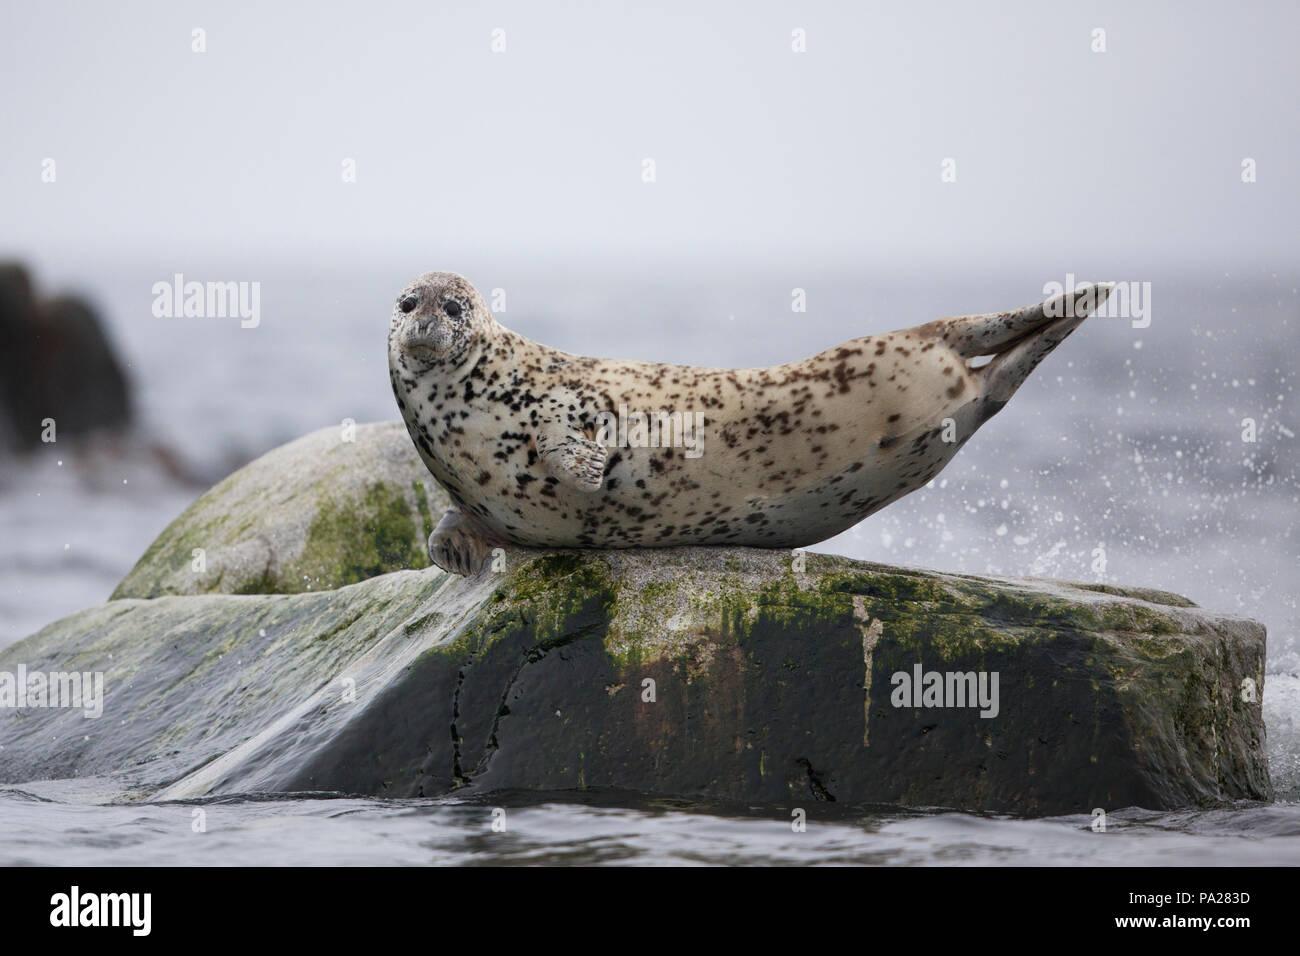 Spotted Seal (Phoca largha), Sea of Okhotsk - Stock Image